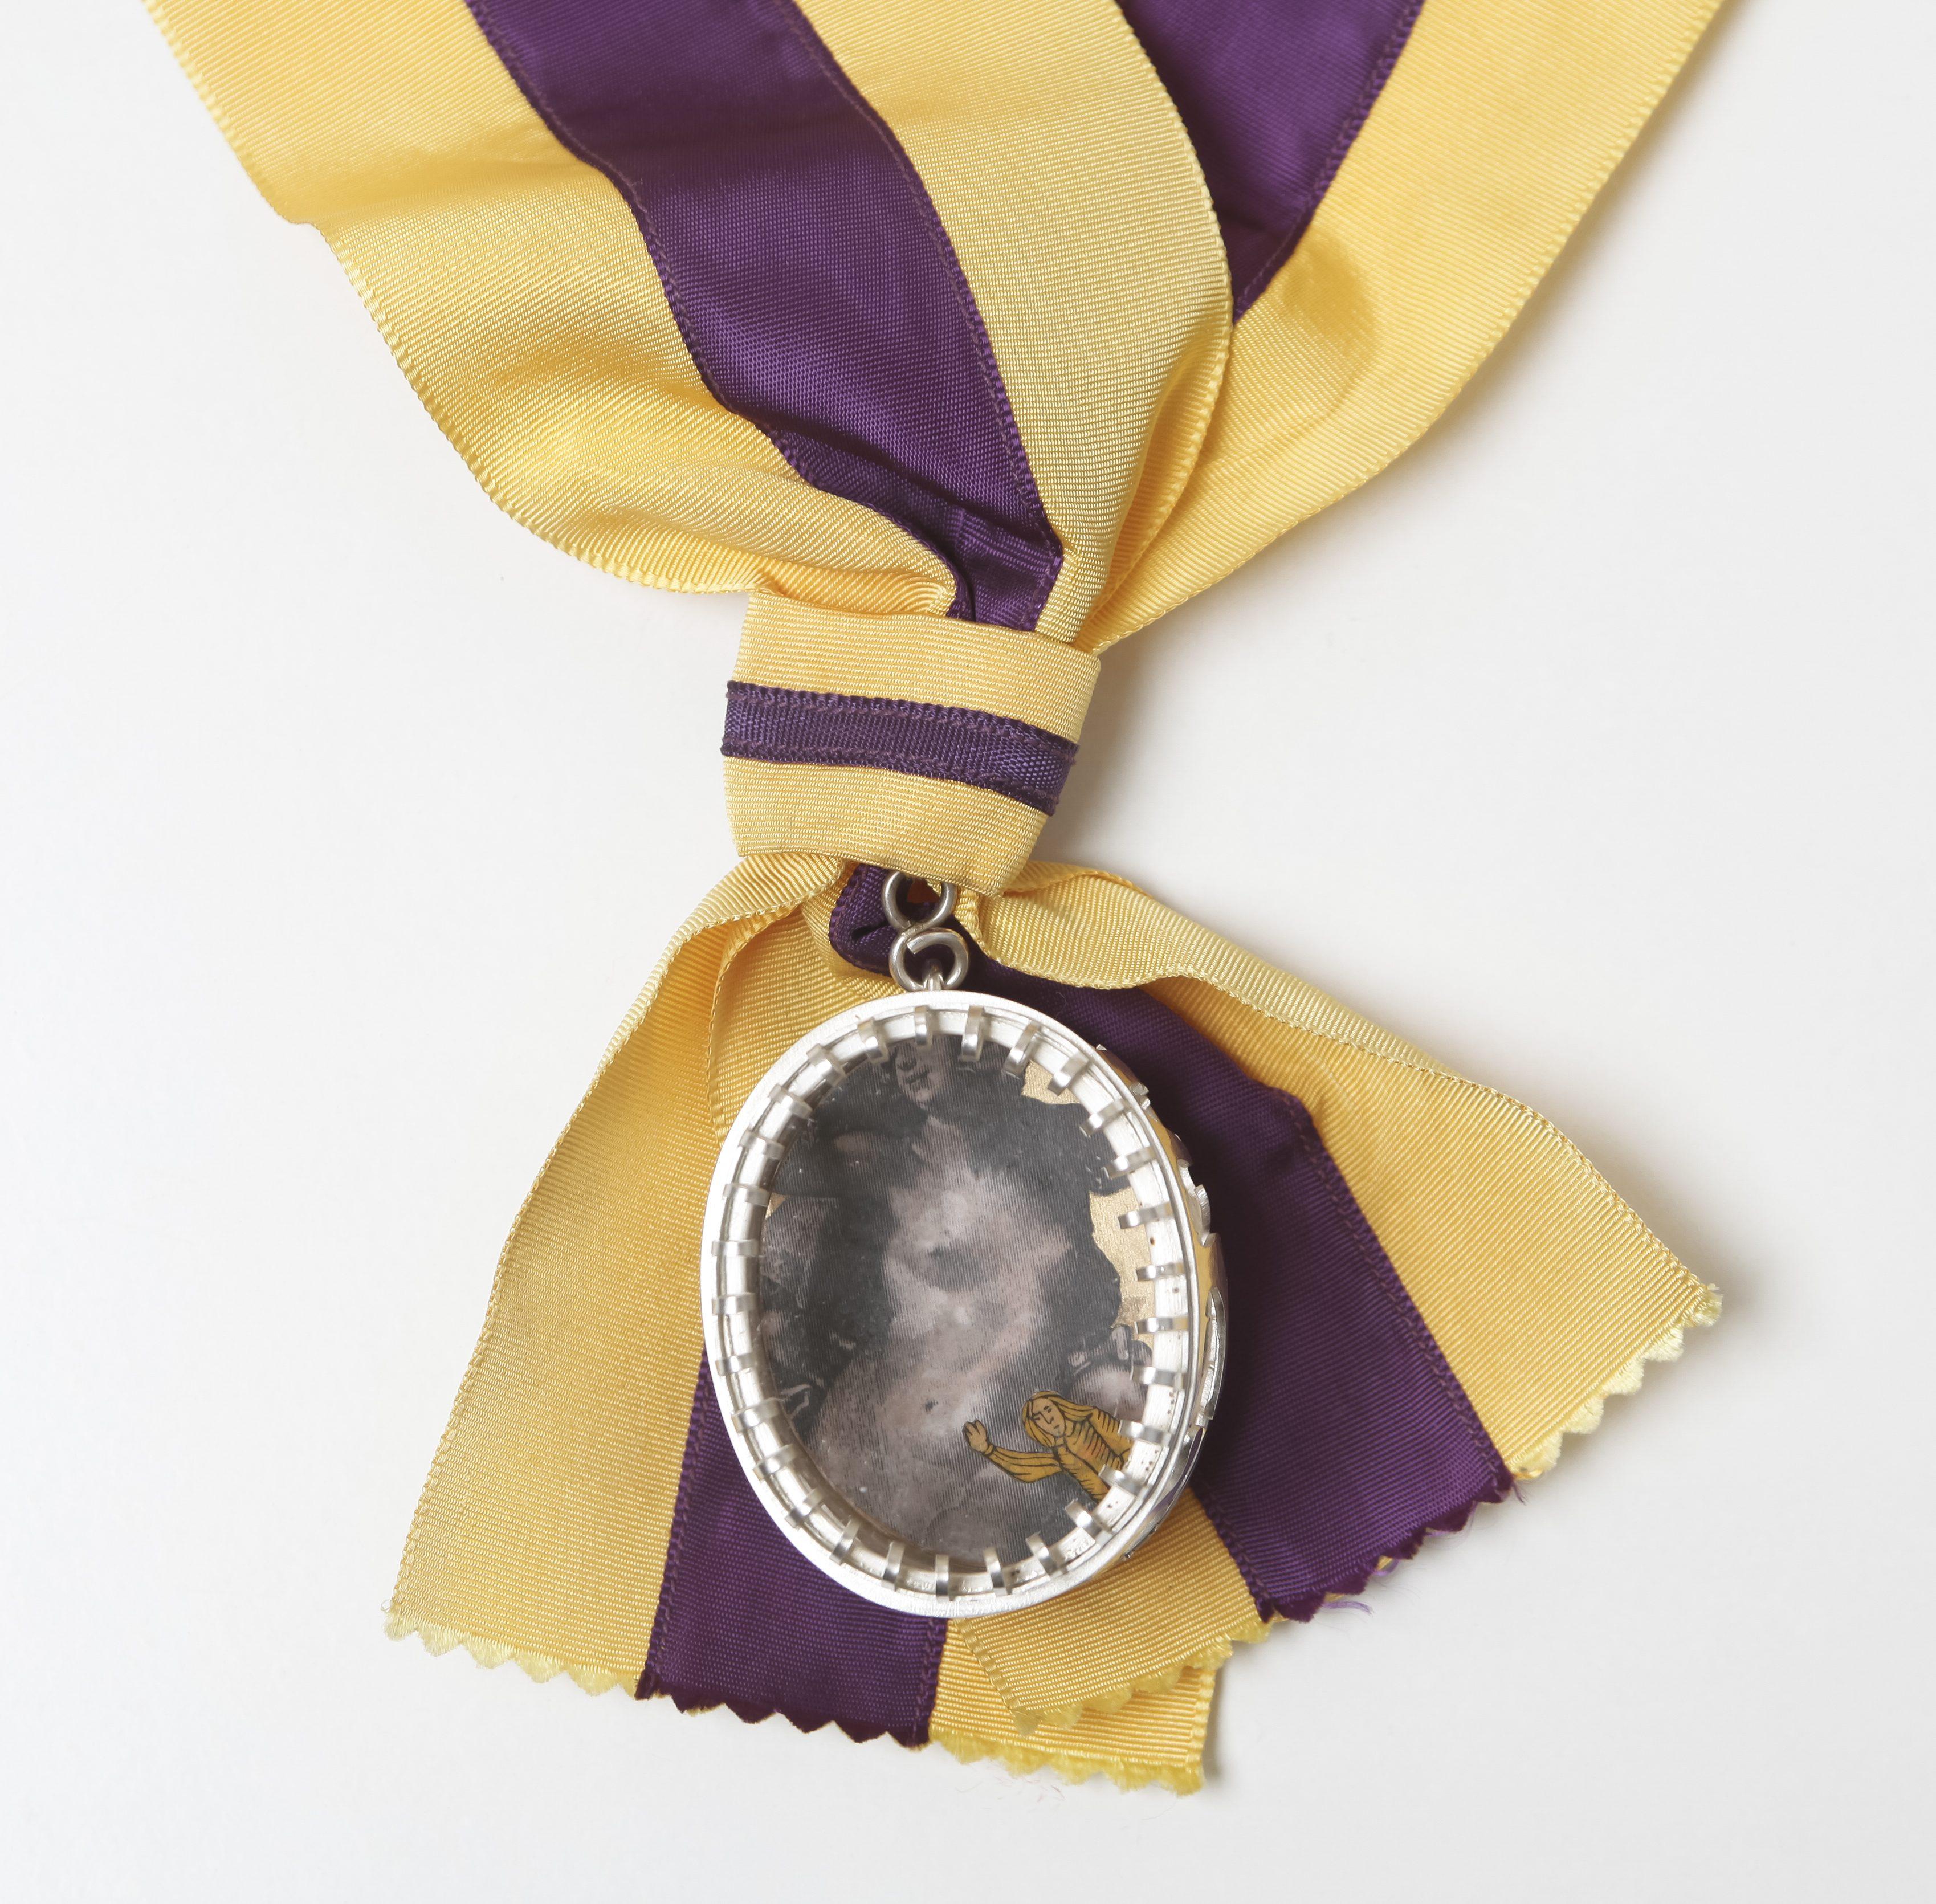 Marília Maria Mira, Immodesty Insignia, 1993. Foto Manuel Portugal, textiel, parfum, koper, glas, papier, was, zijde